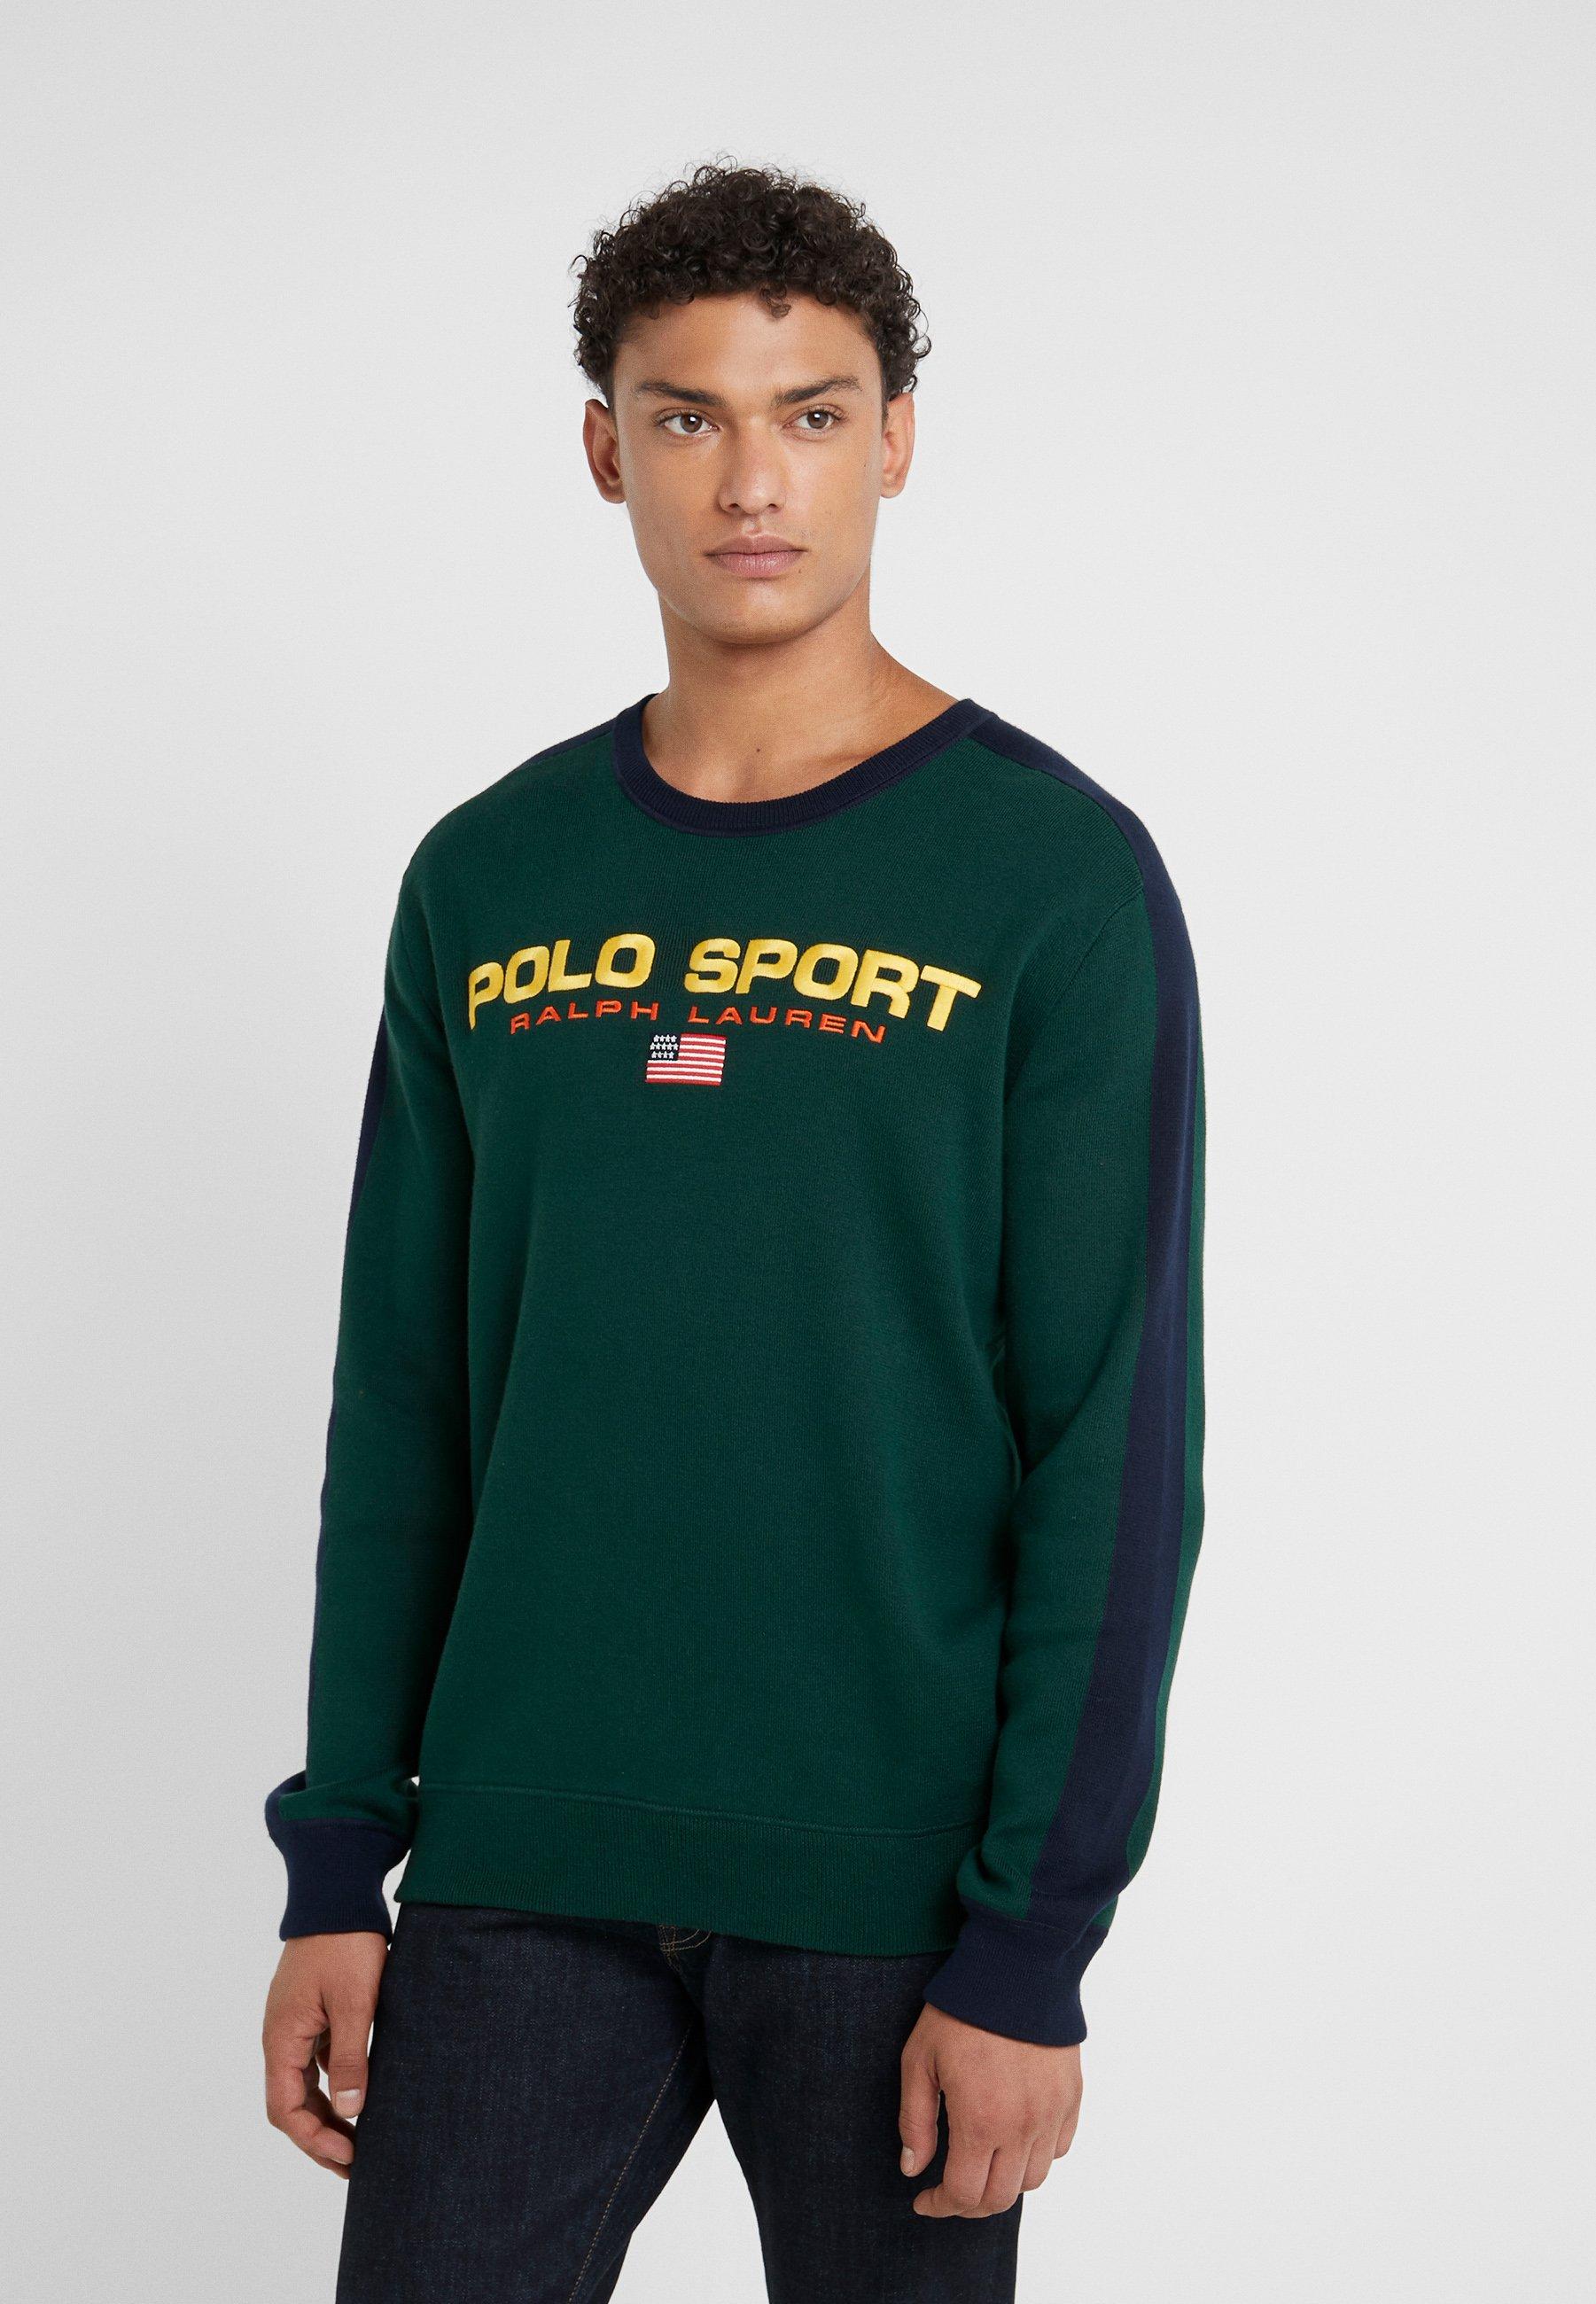 Polo Ralph Lauren Sweter - forest/navy